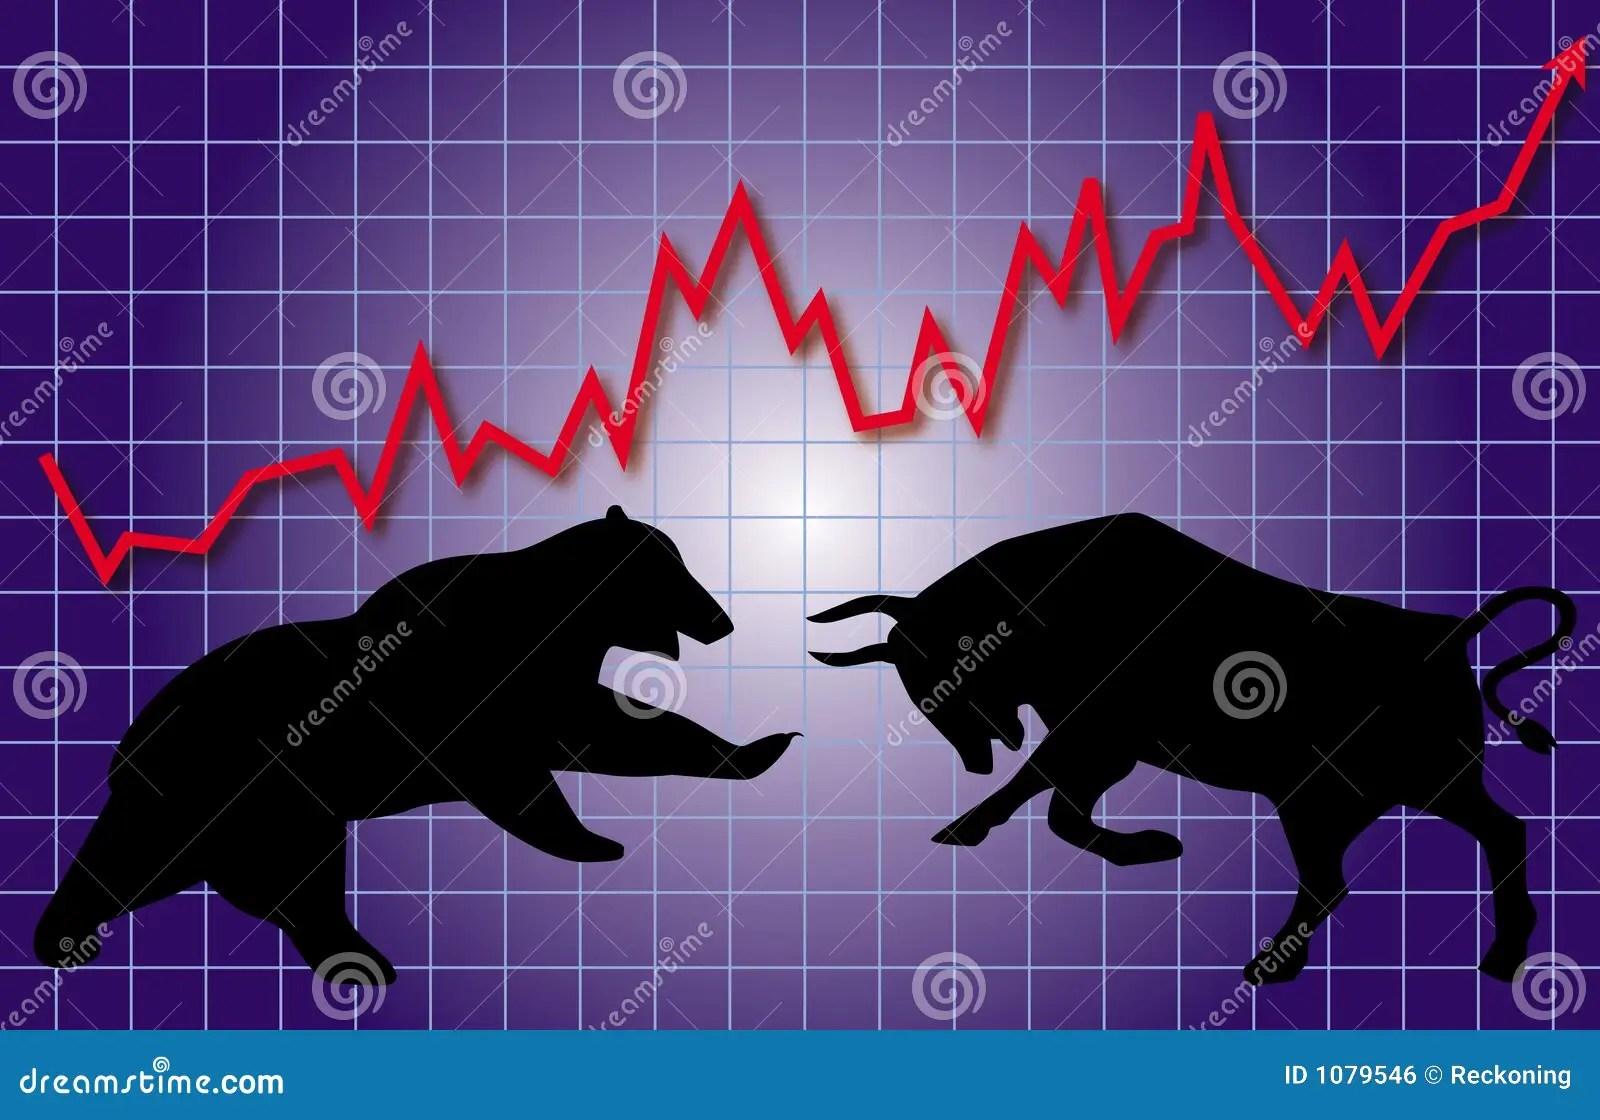 Wall Street Bull Wallpaper Hd Stock Market Bull Amp Bear Royalty Free Stock Image Image